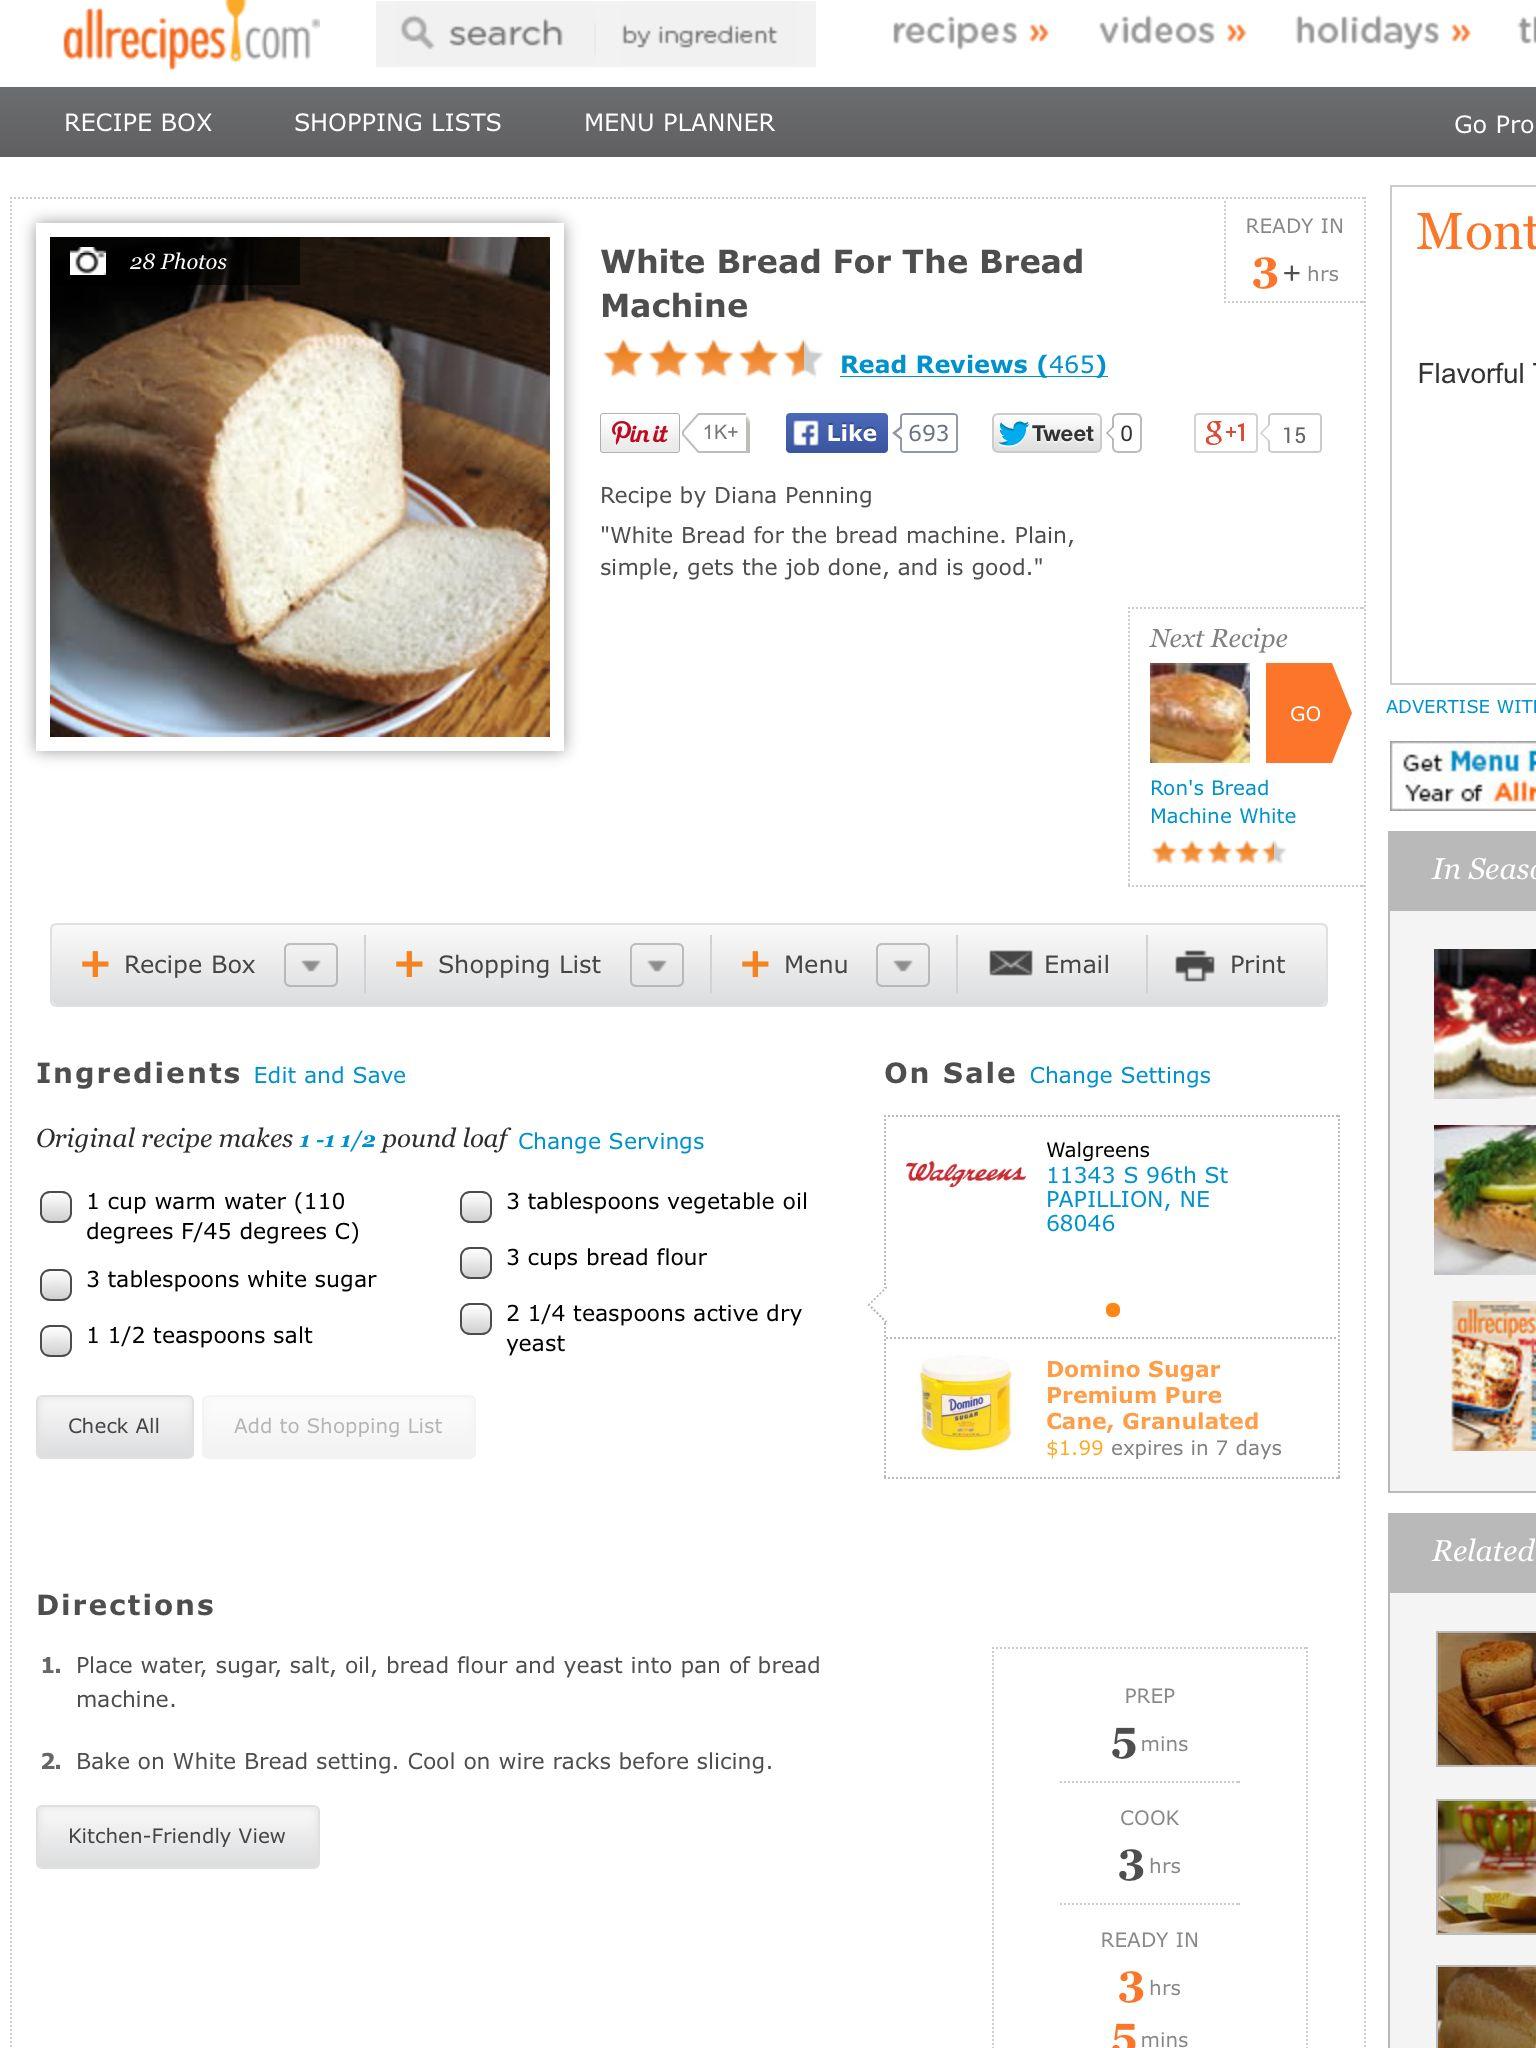 Allrecipes.com bread recipe. Can substitute AP flour ...